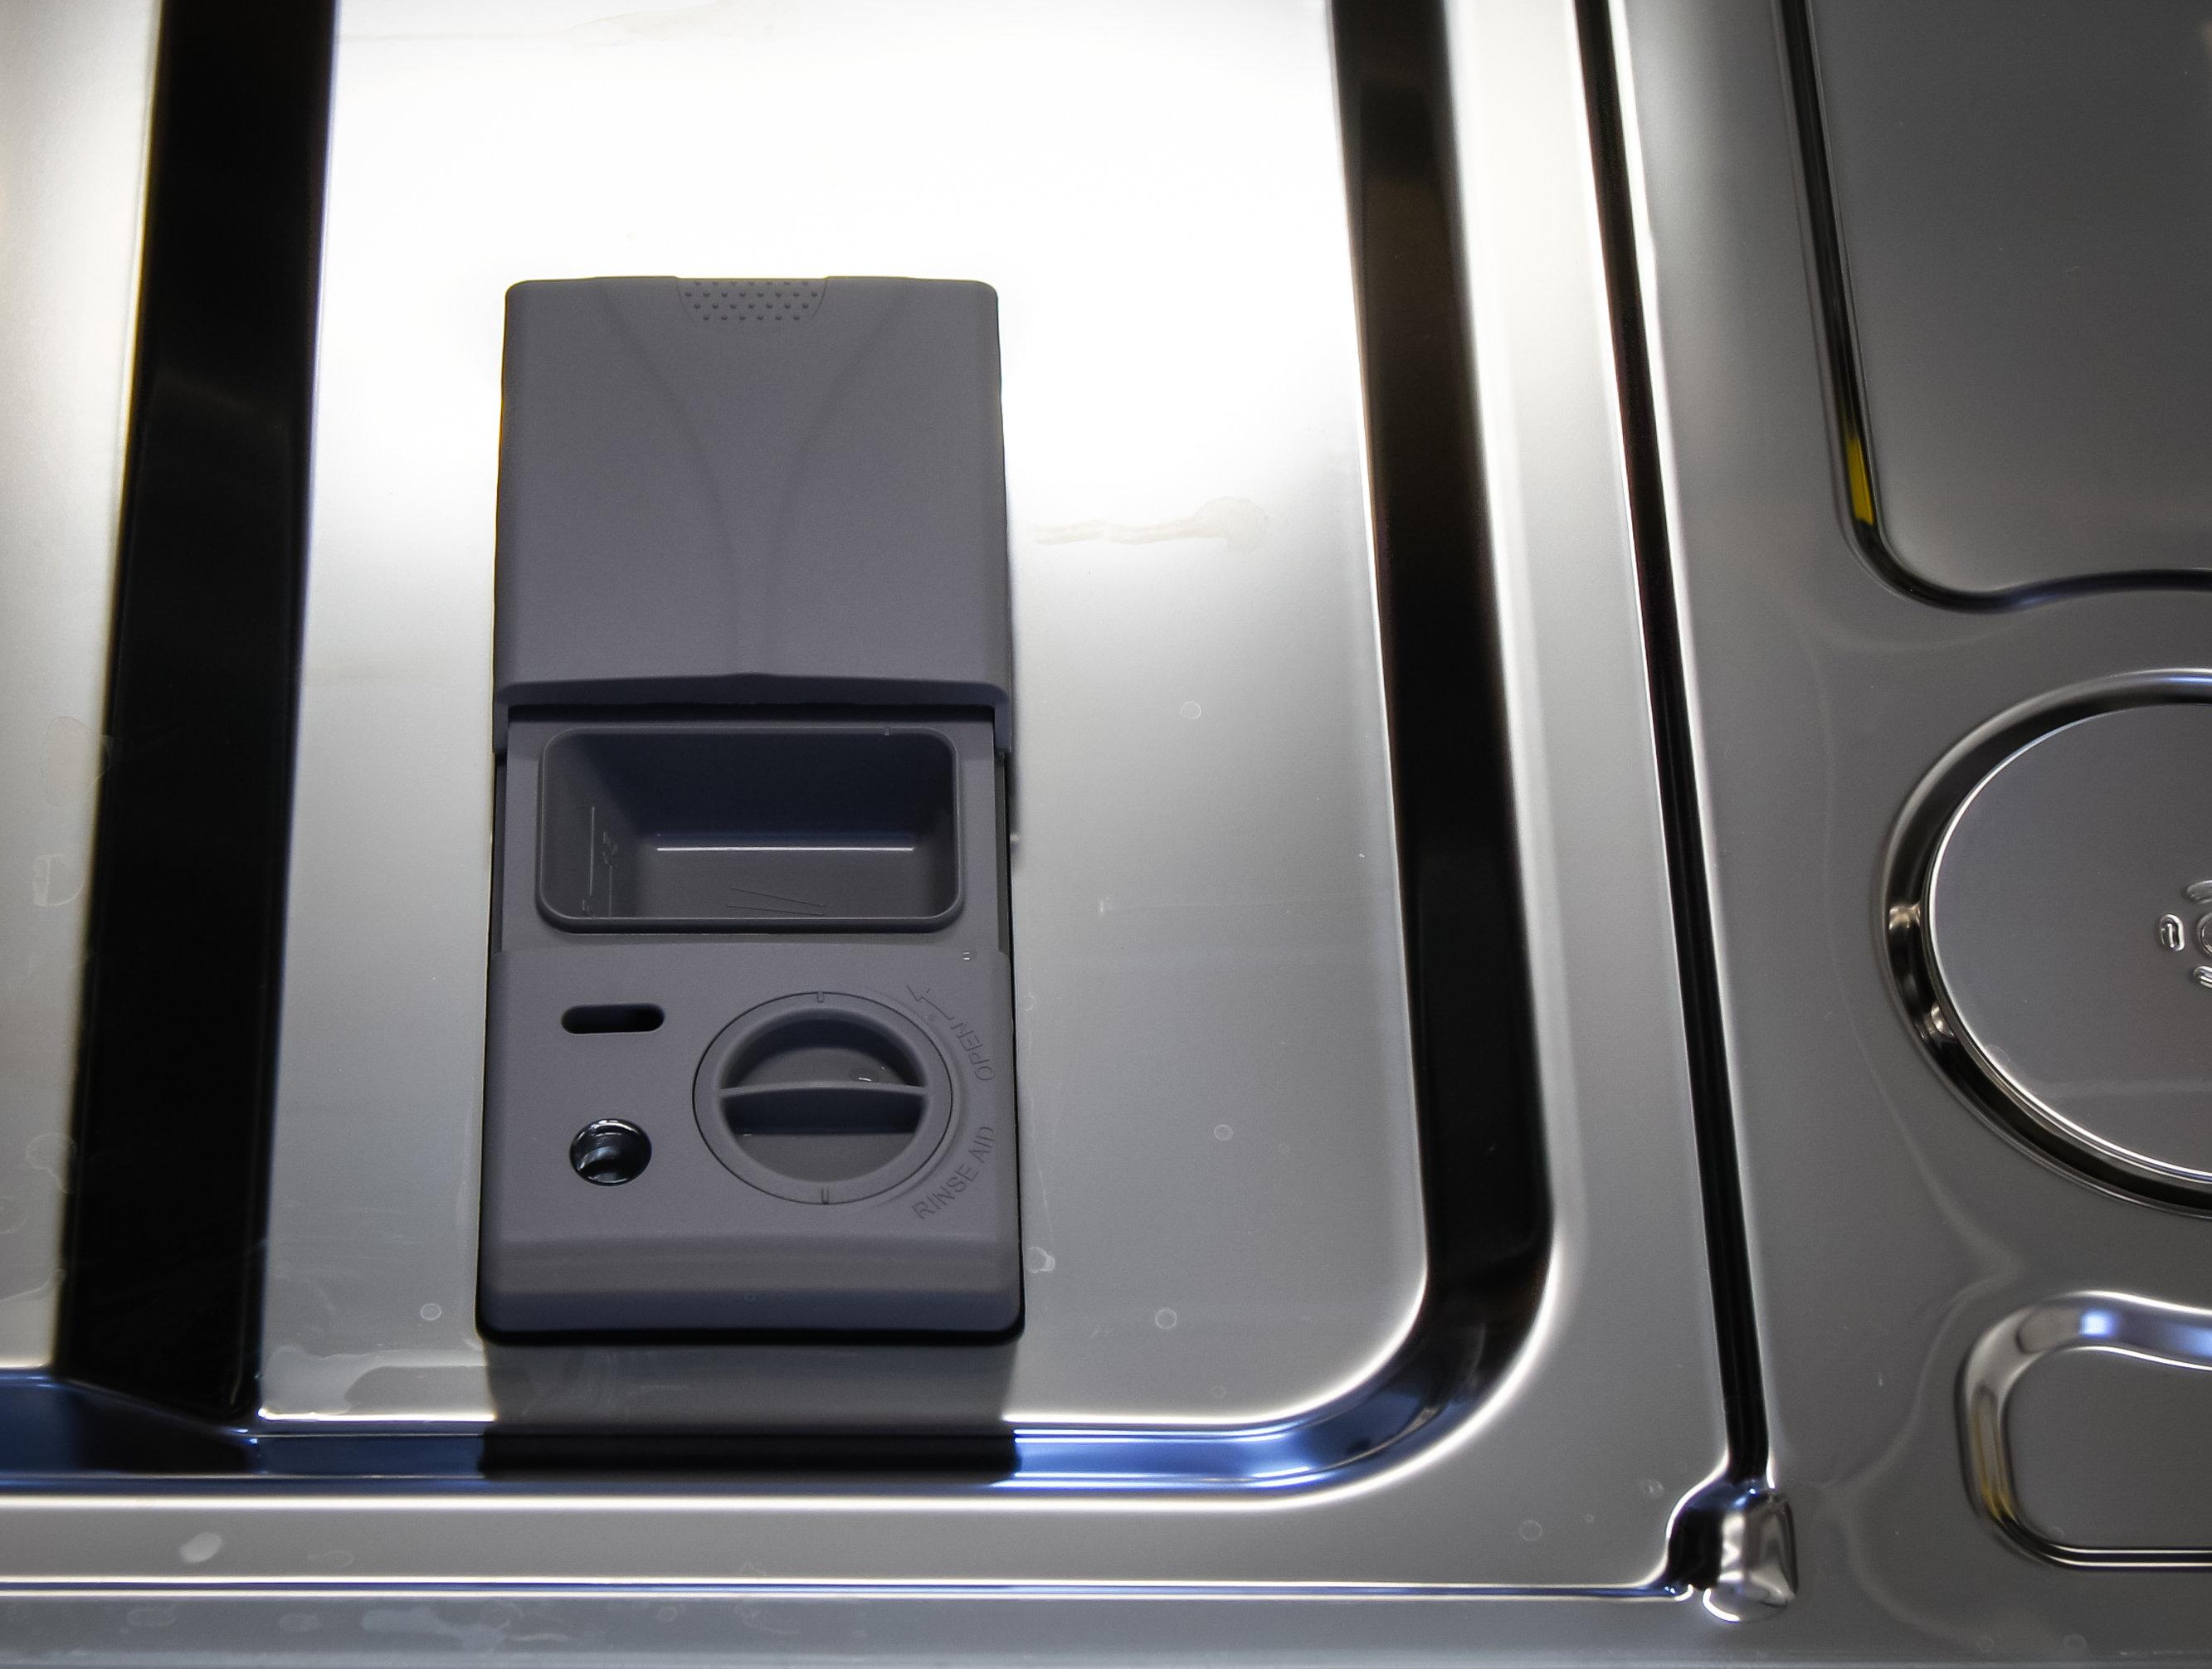 Samsung DW80H9930US rinse aid and detergent dispenser